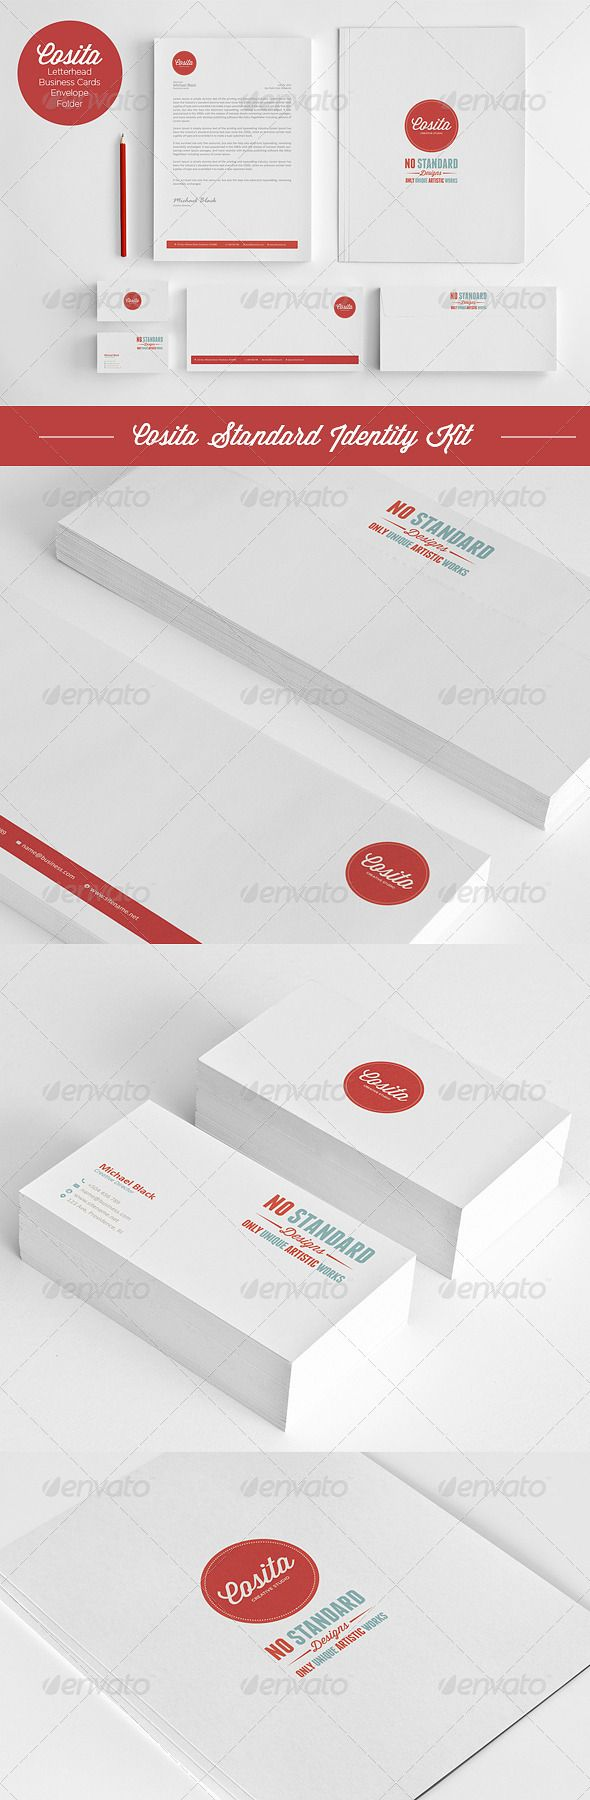 Cosita Standard Corporate Identity  #folder #identity #letterhead • Click here to download ! http://graphicriver.net/item/-cosita-standard-corporate-identity/4085533?s_rank=136&ref=pxcr